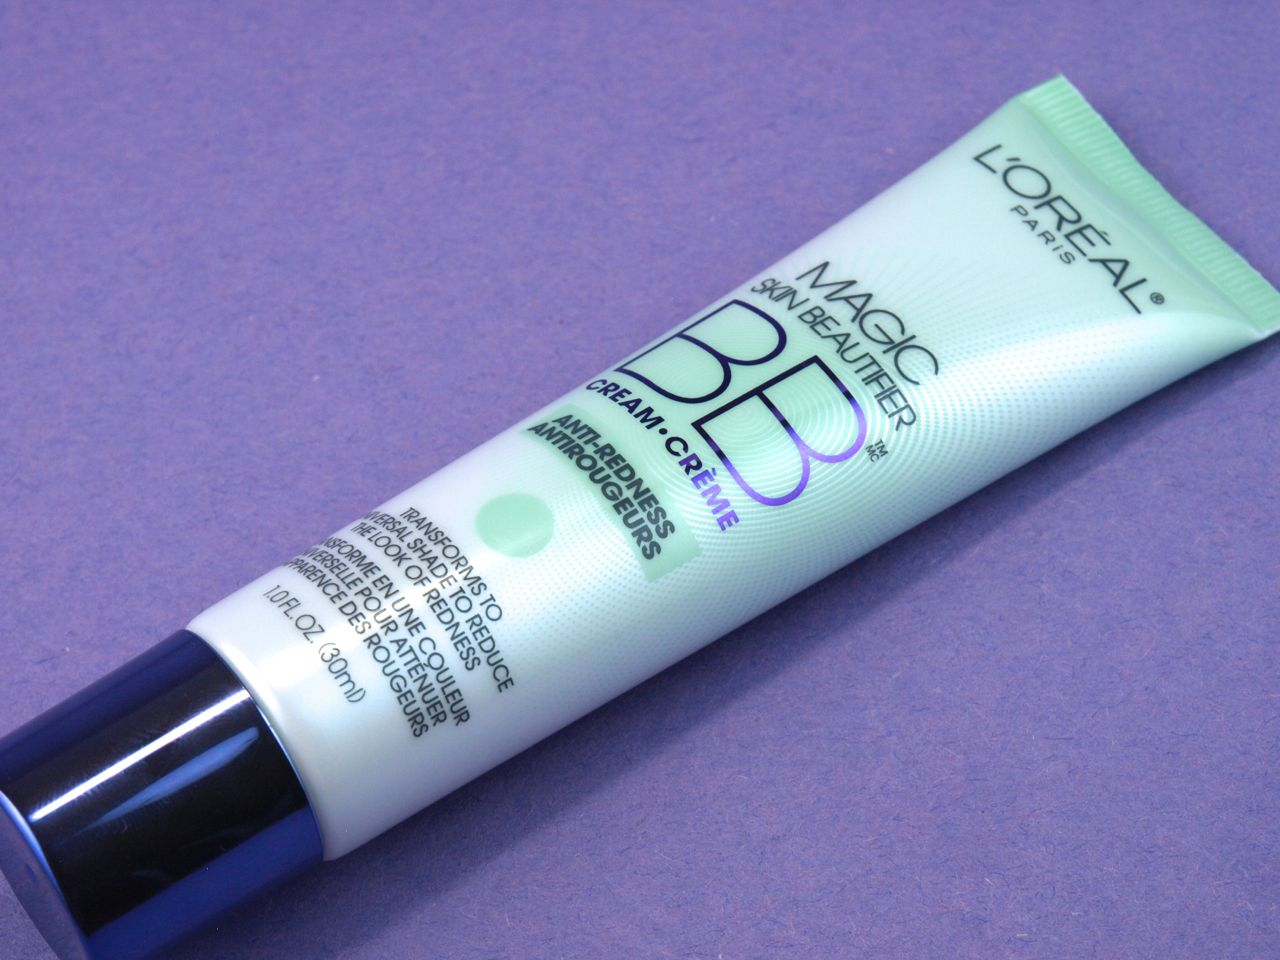 L'Oreal Magic Skin Beautifier BB Cream in